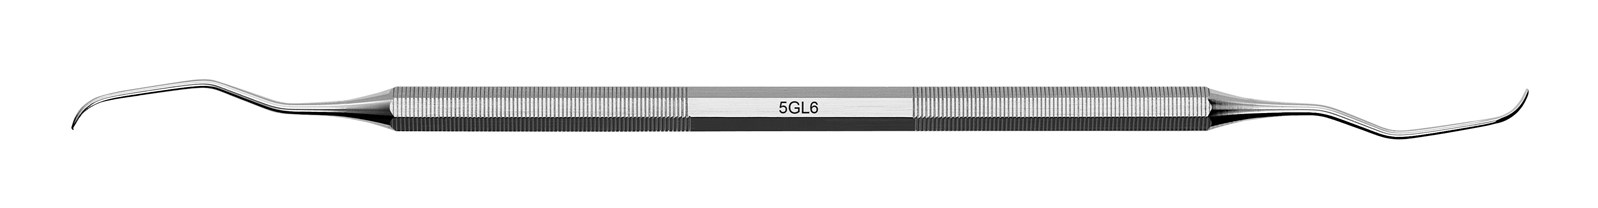 Kyreta Gracey Deep - 5GL6, ADEP šedý